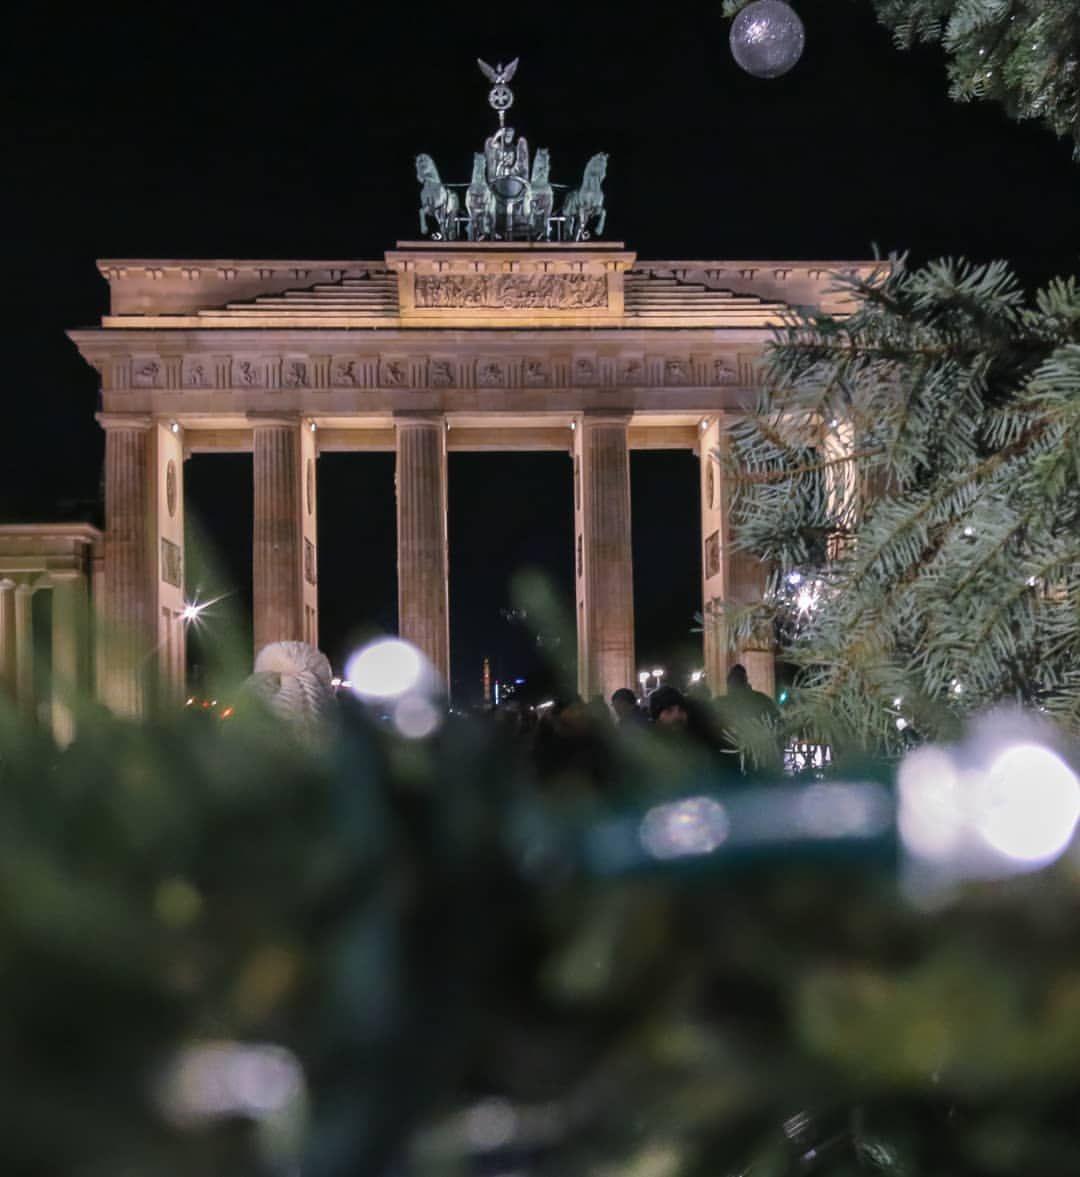 Karsten Auf Instagram Christmas Mood Berlin Visit Berlin Ig Berlin Igersberlin Officialfanofberlin Berlingram Dasechteberlin Loves United Berlin